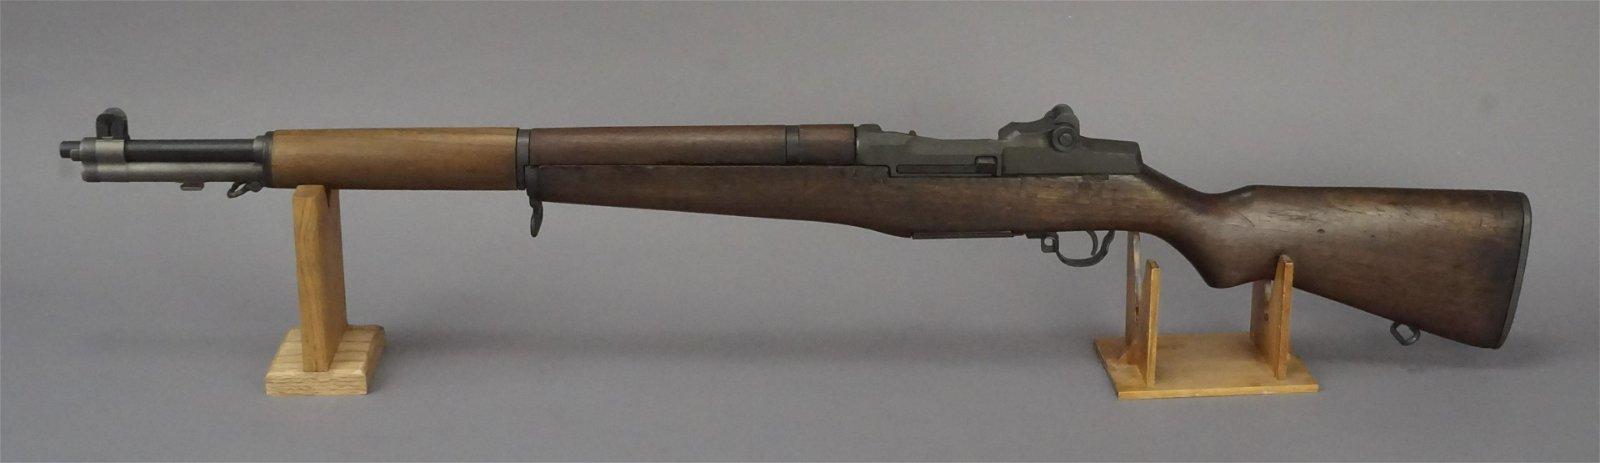 WWII M1 - .30 - 06 Springfield CAI Garand Rifle